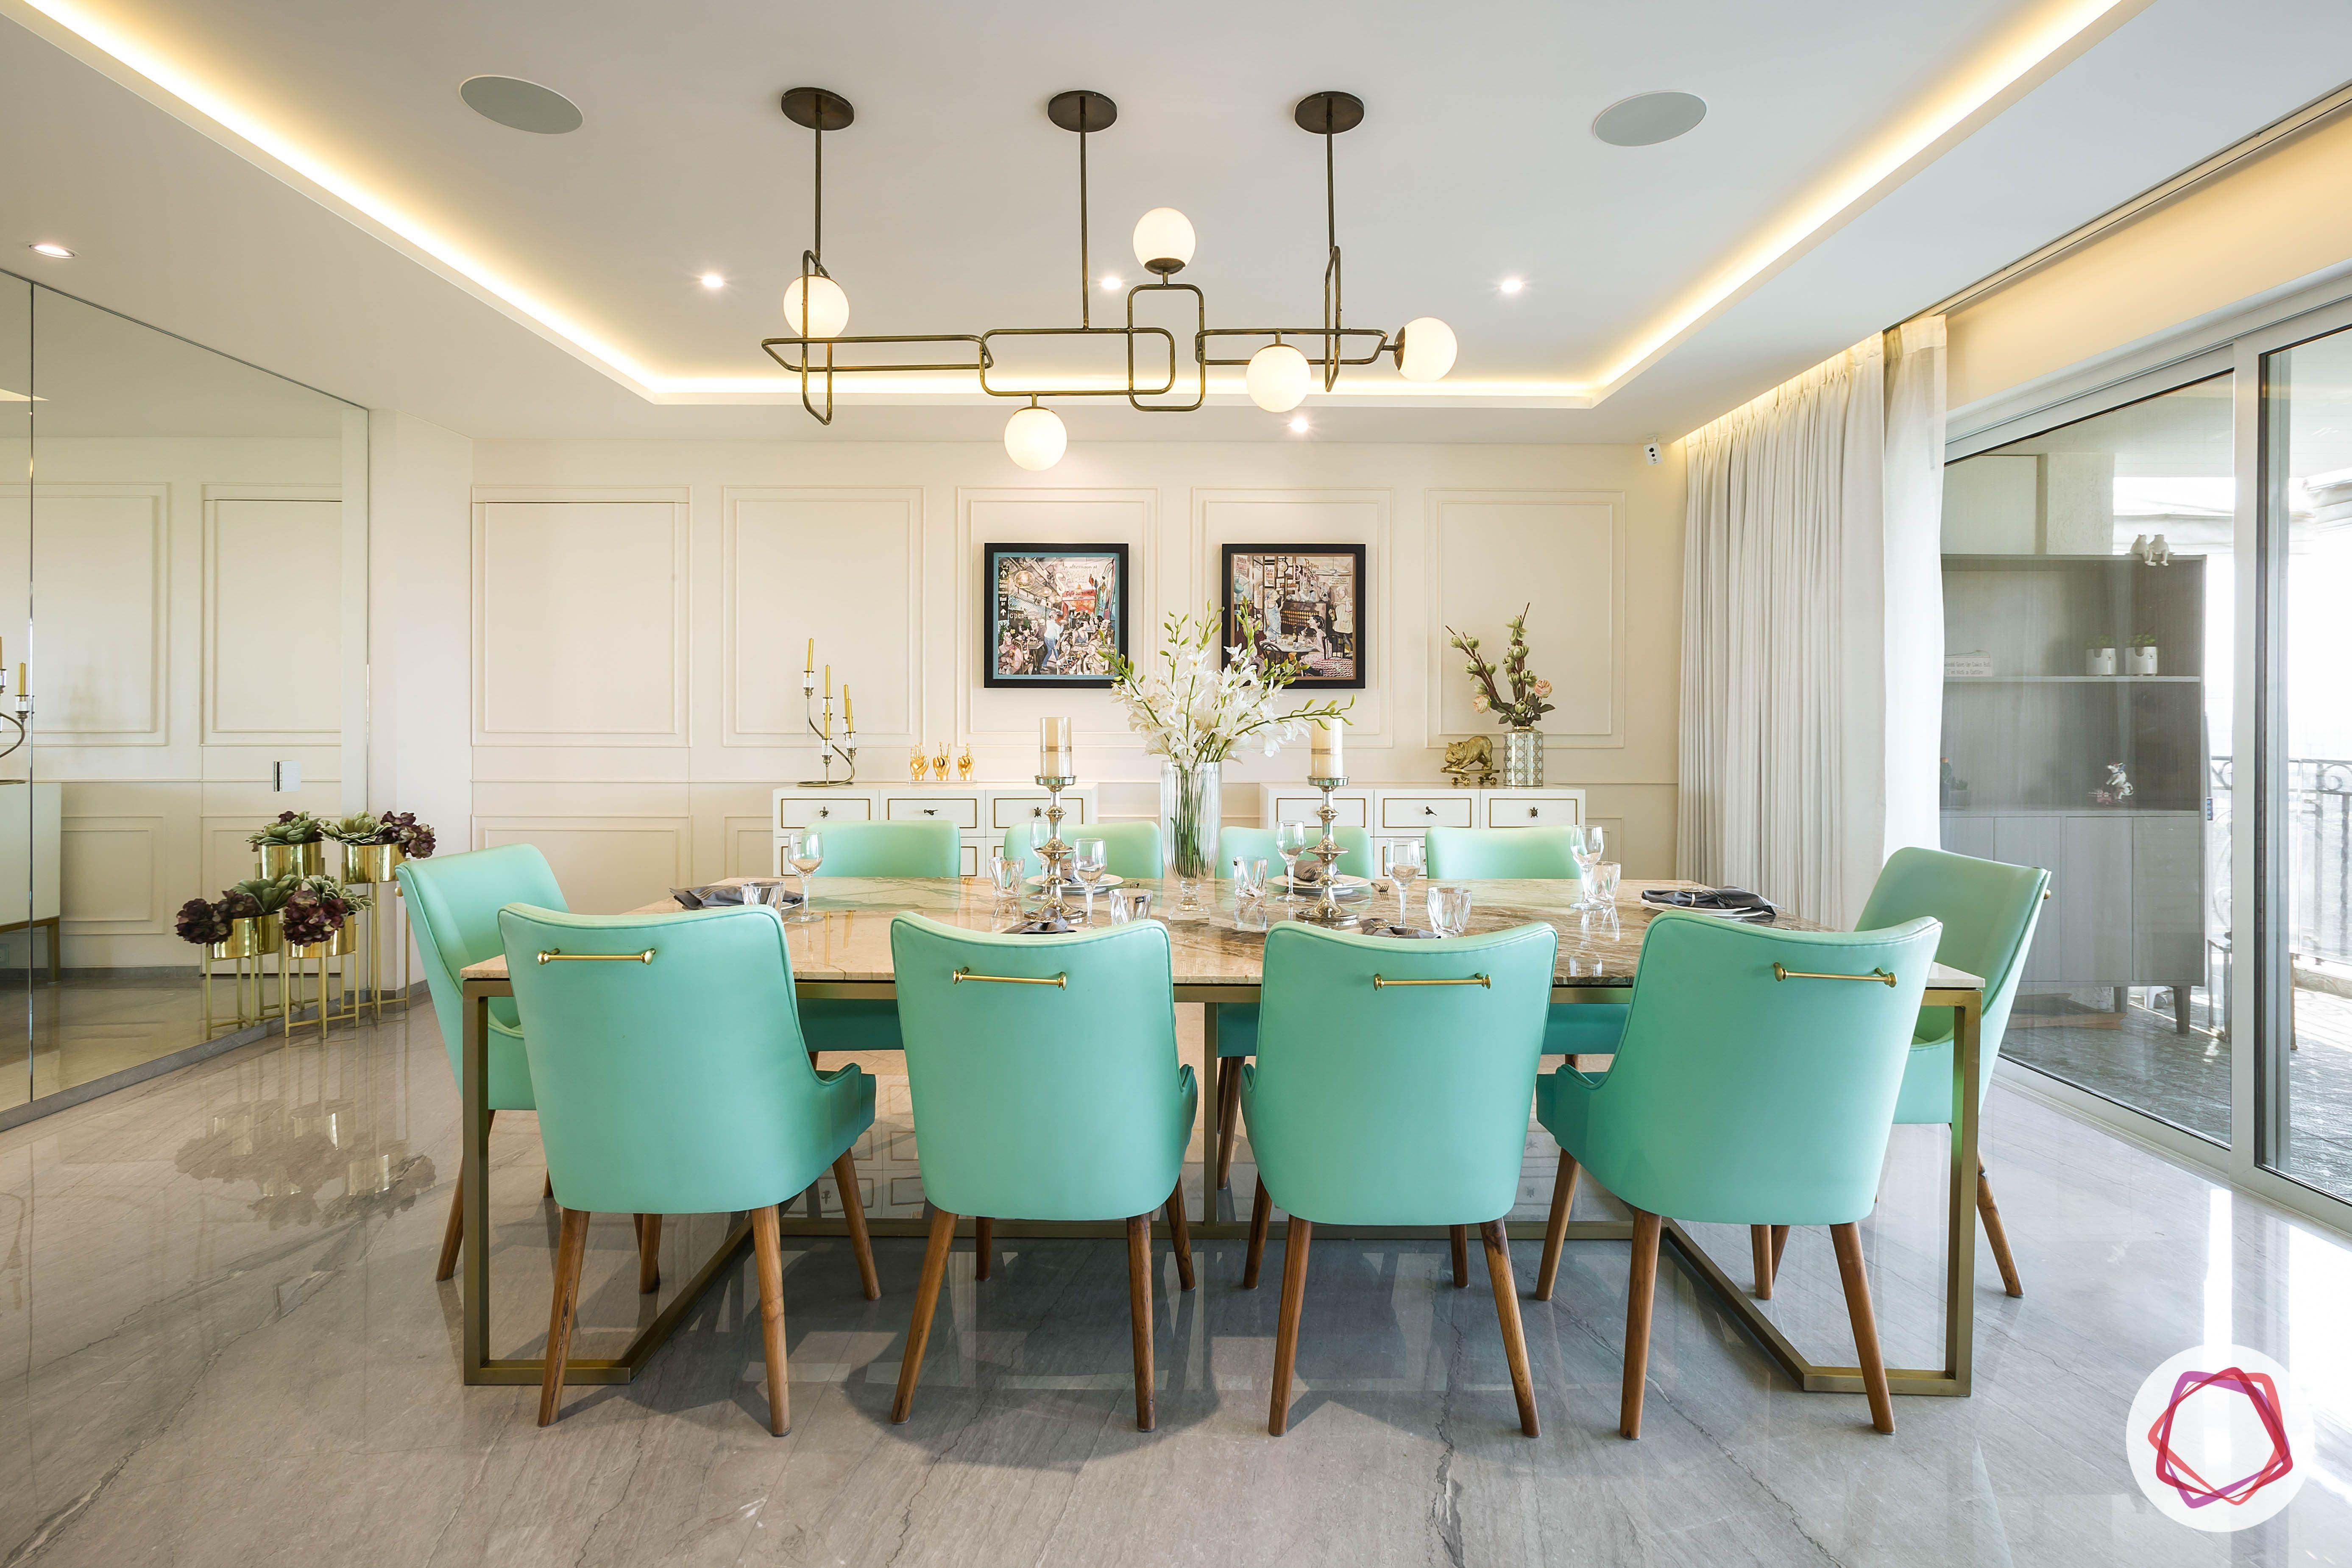 condo-interior-design-mint-green-chairs-leatherette-chair-designs